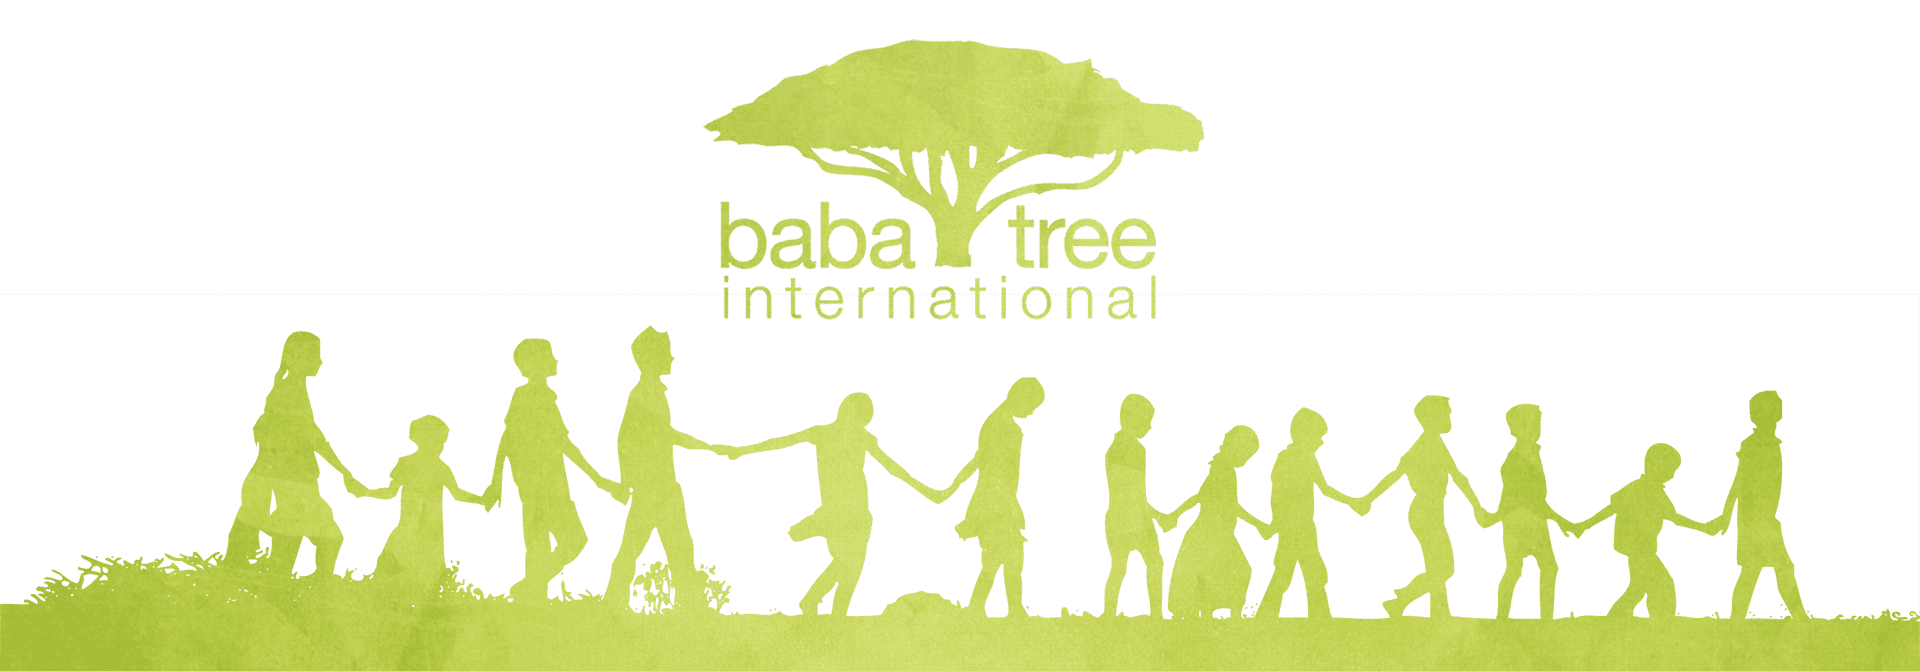 Baba Tree International